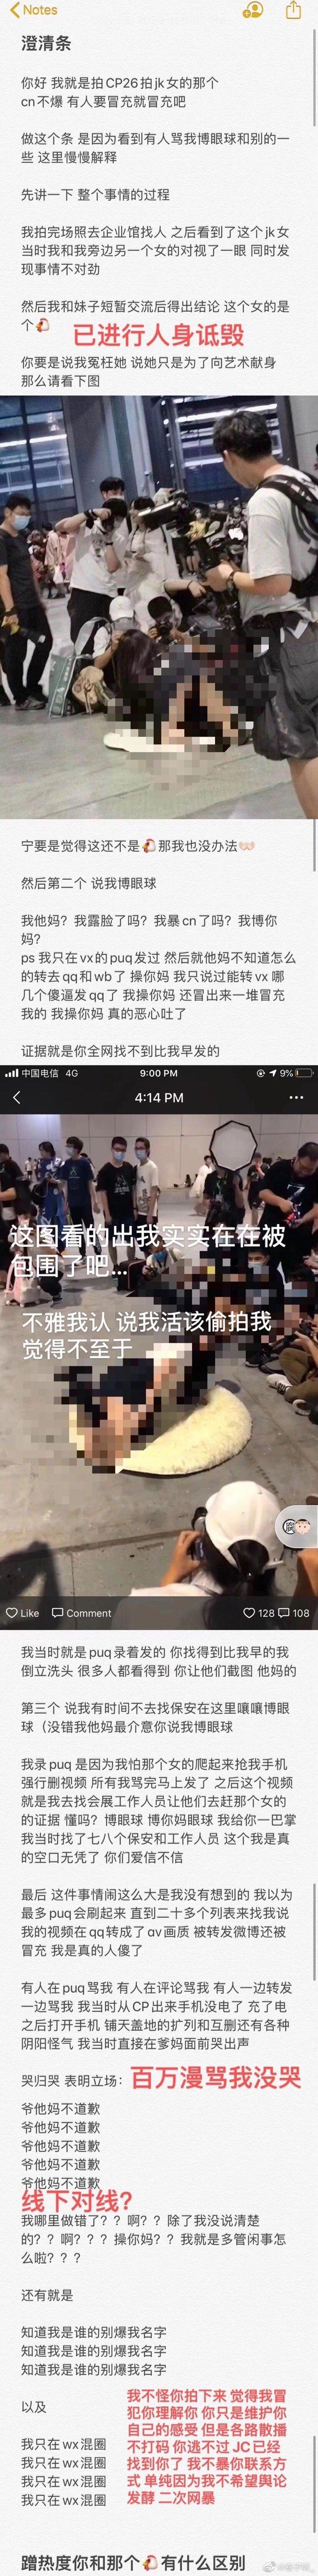 CP26JK 偷拍 网络暴力 报警